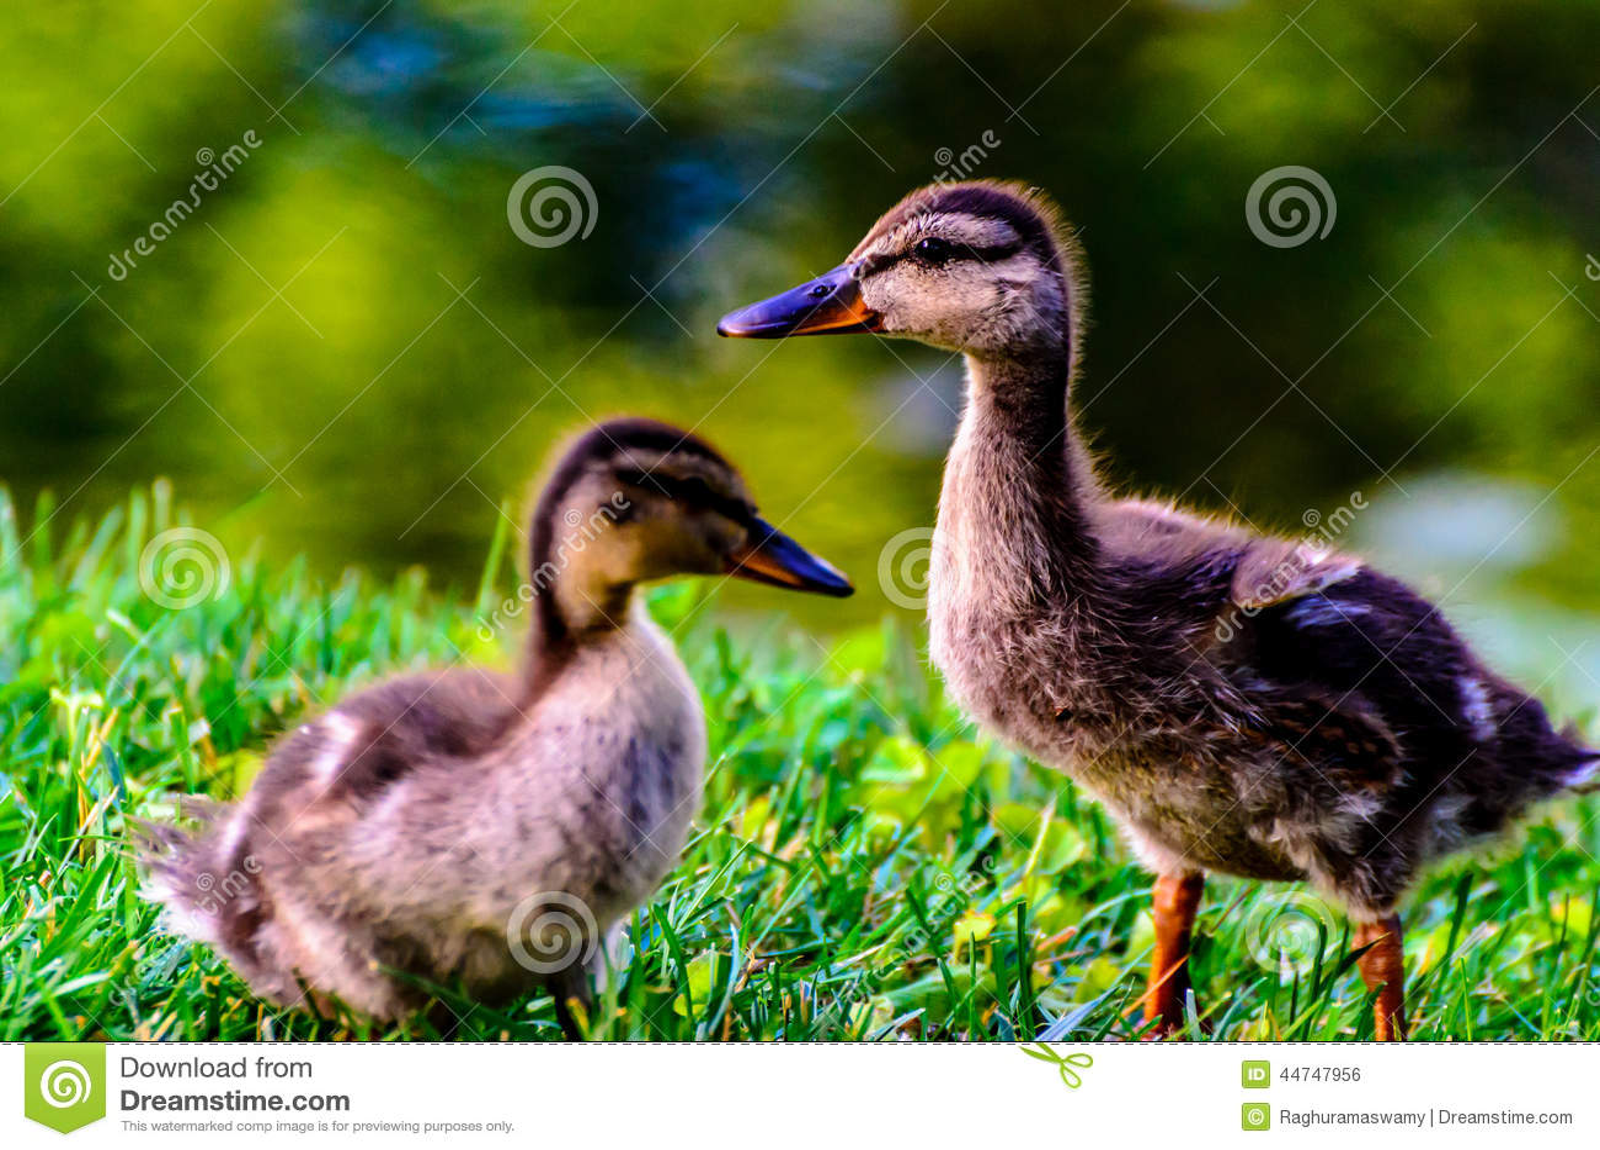 Cute Duckling Wallpaper Cute Baby Mallard Ducks